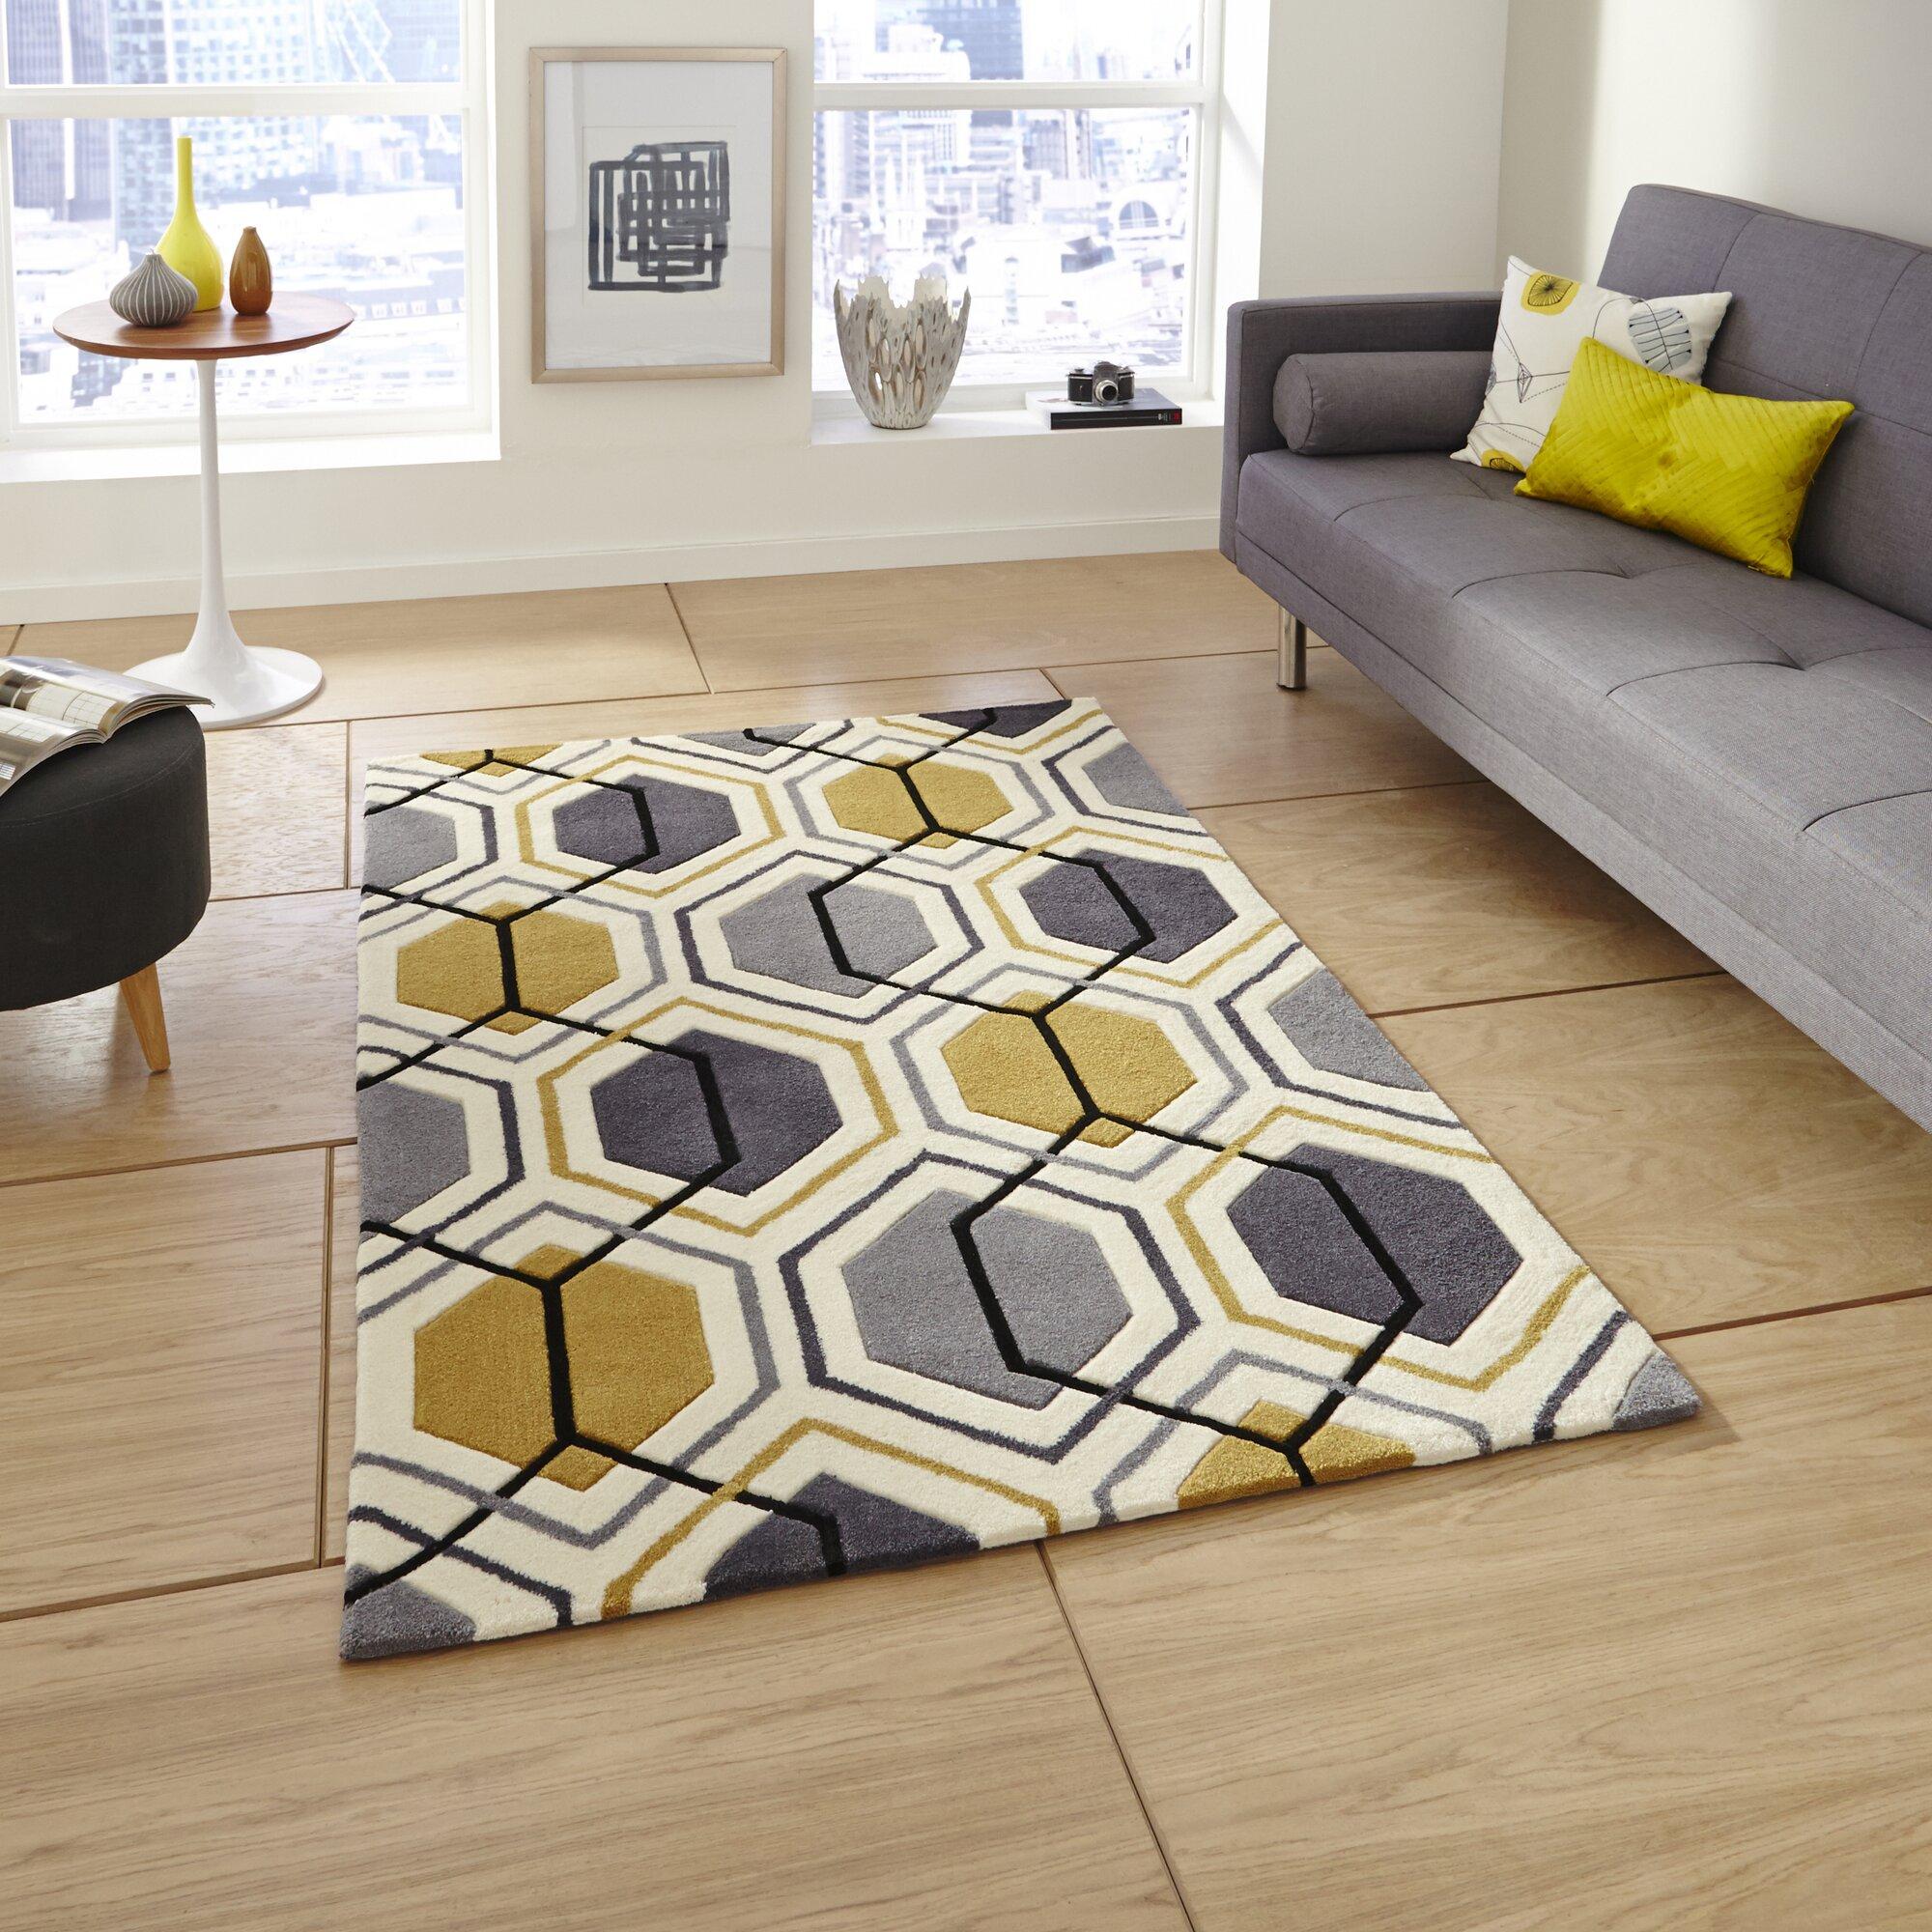 scanmod design handgetufteter teppich tamarisk in grau. Black Bedroom Furniture Sets. Home Design Ideas